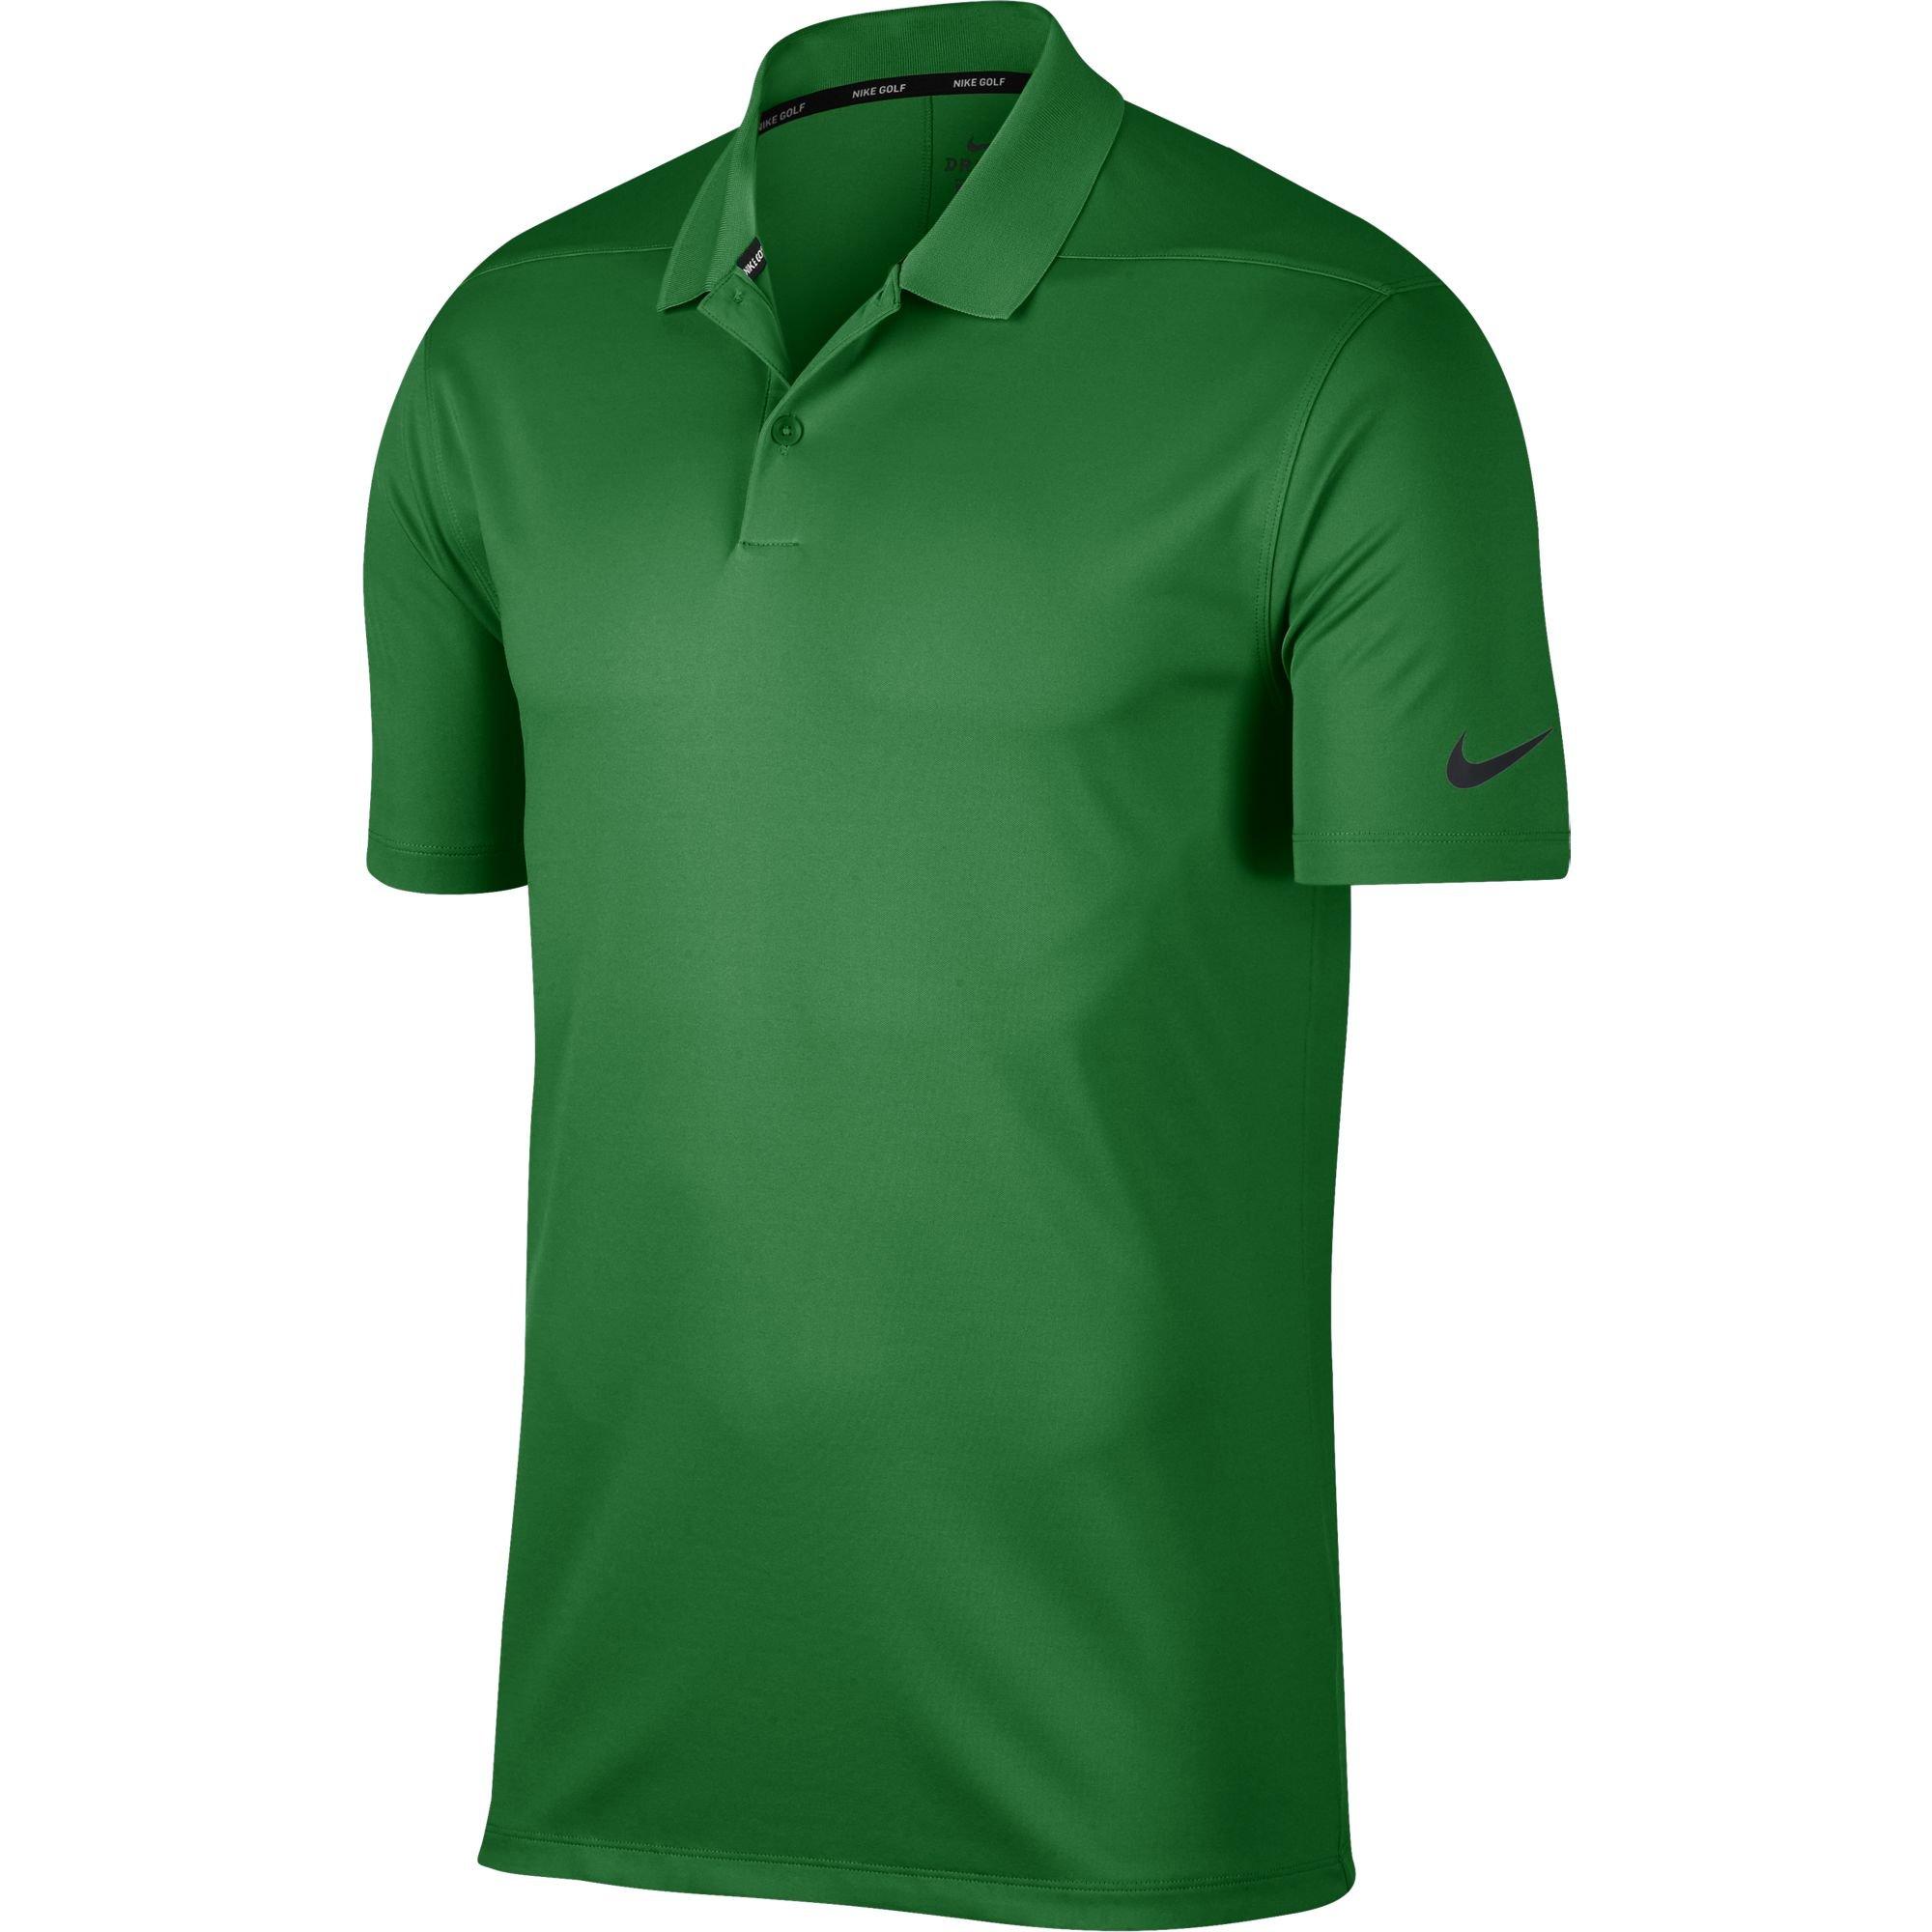 8b5b1d09 Galleon - Nike Men's Dry Victory Solid Golf Polo (Classic Green/Black,  Medium)